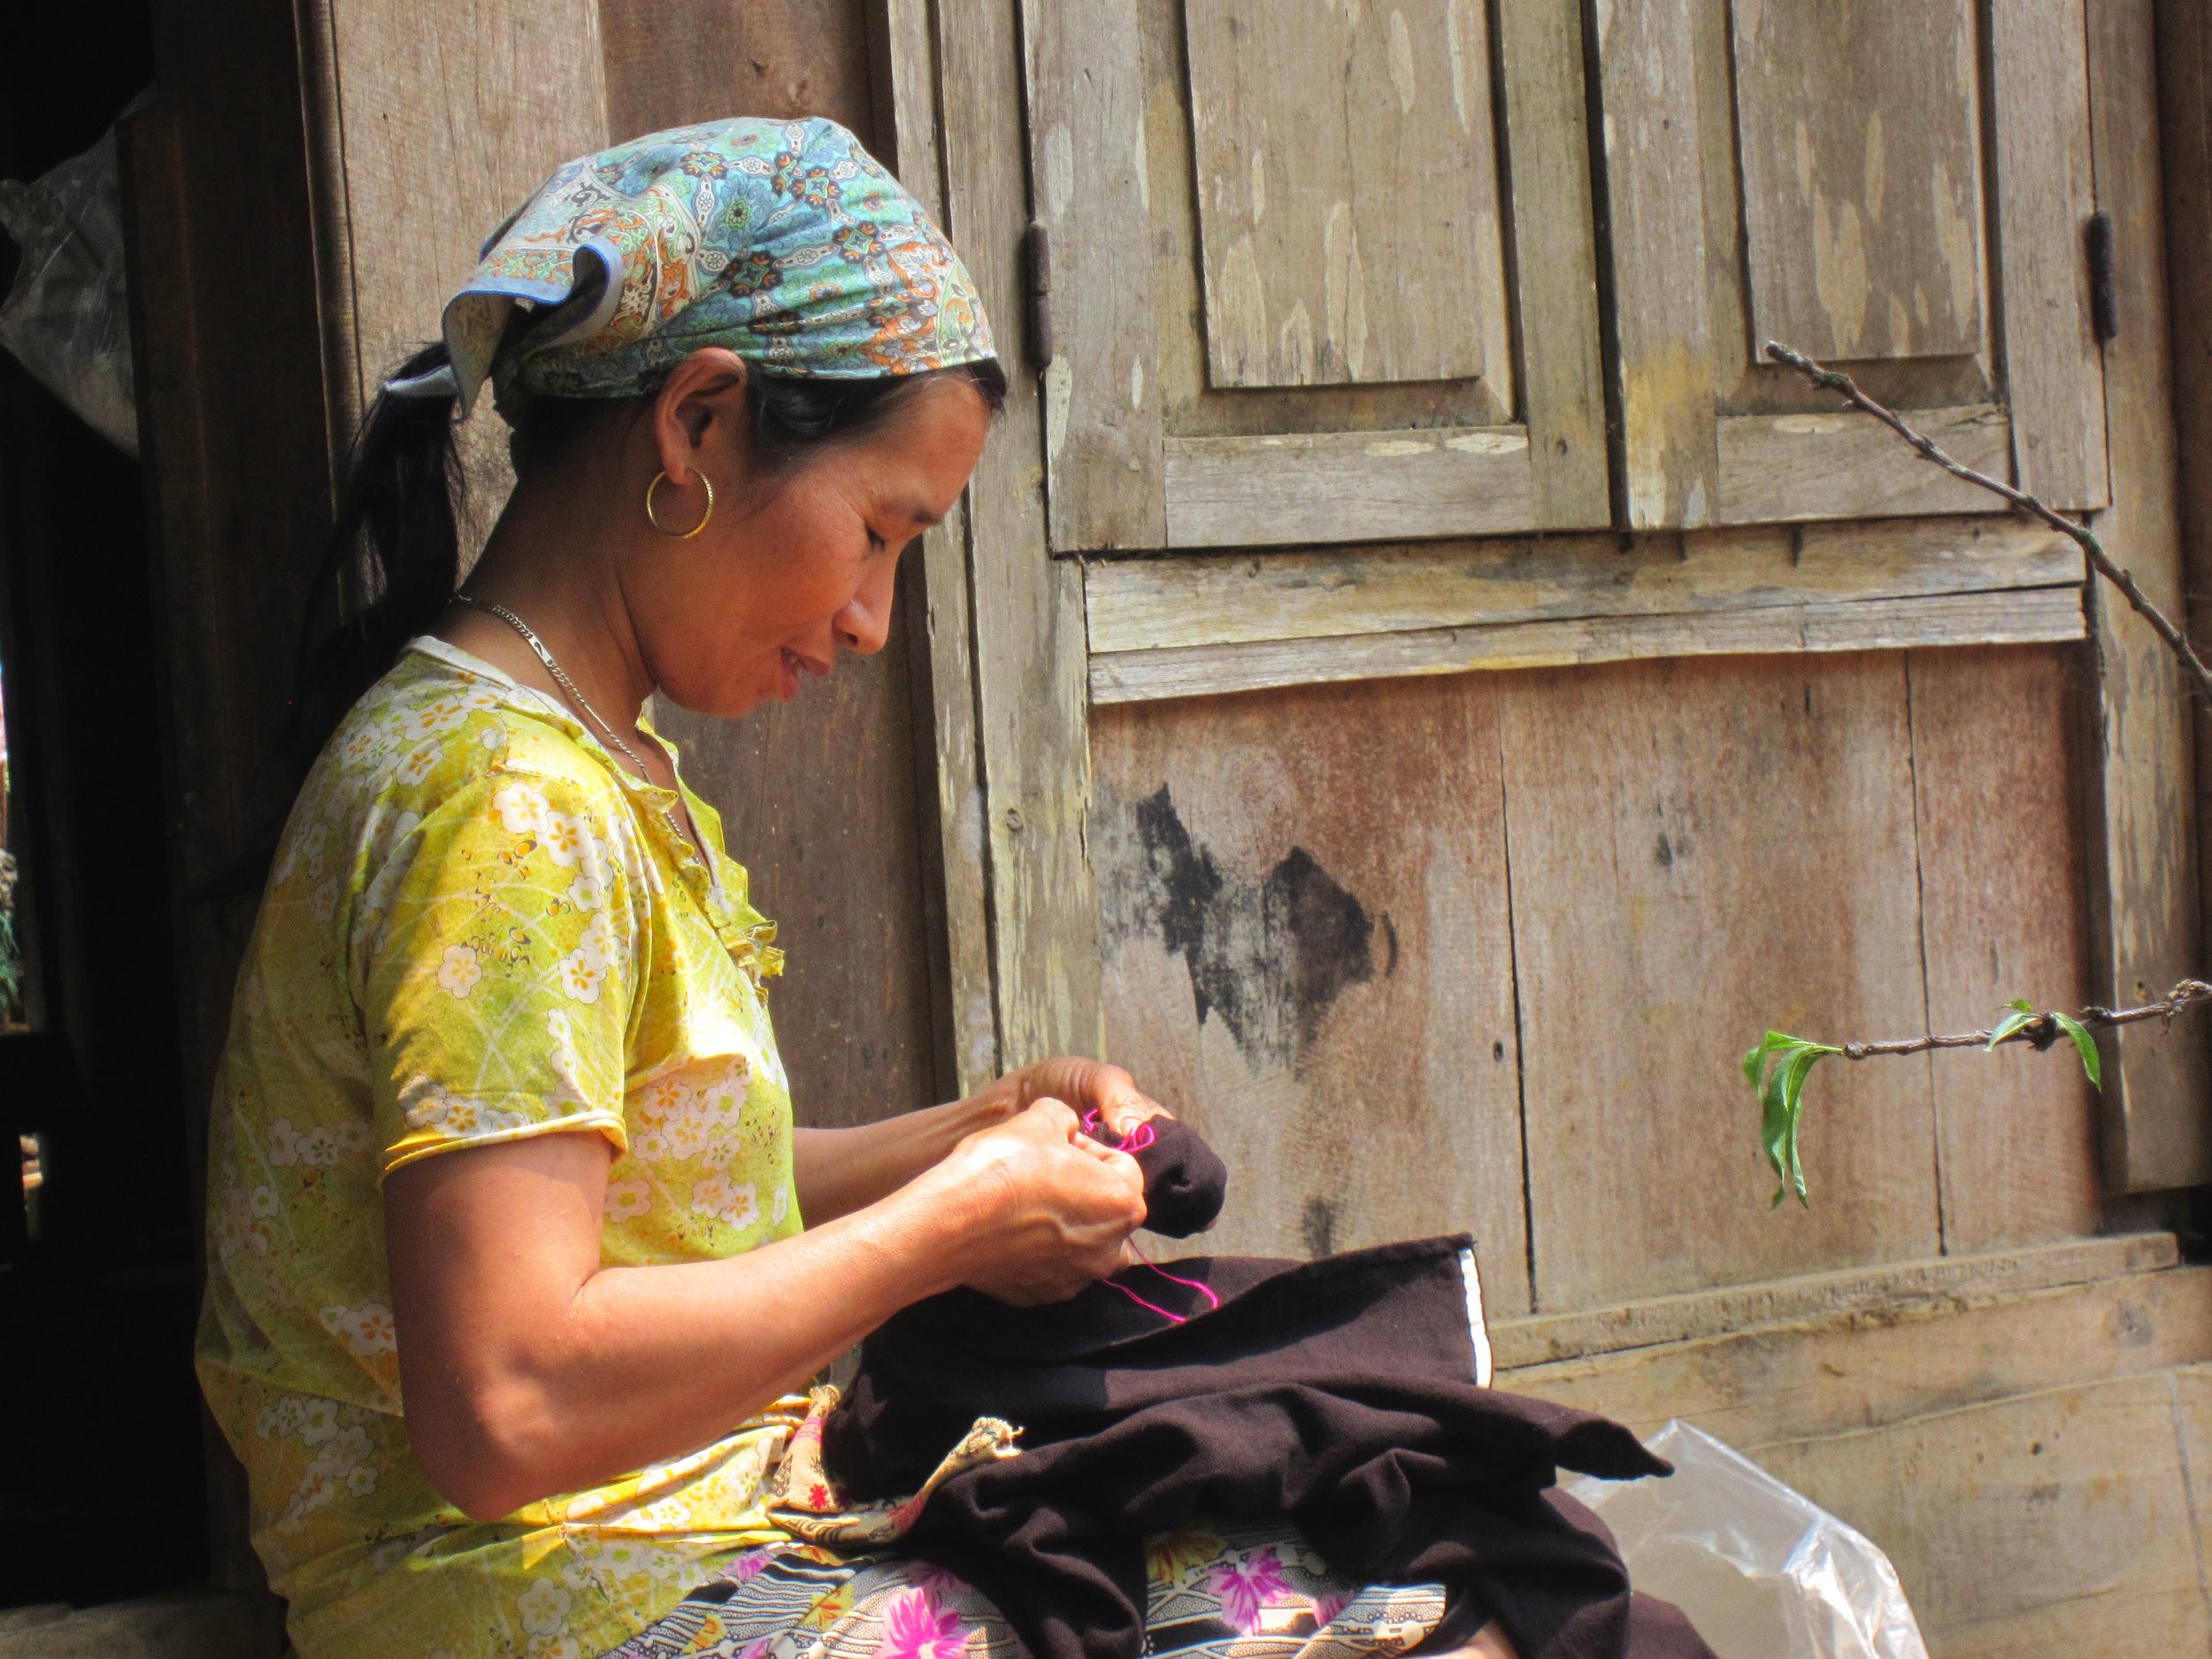 Sewing time - Mai Chau, Vietnam